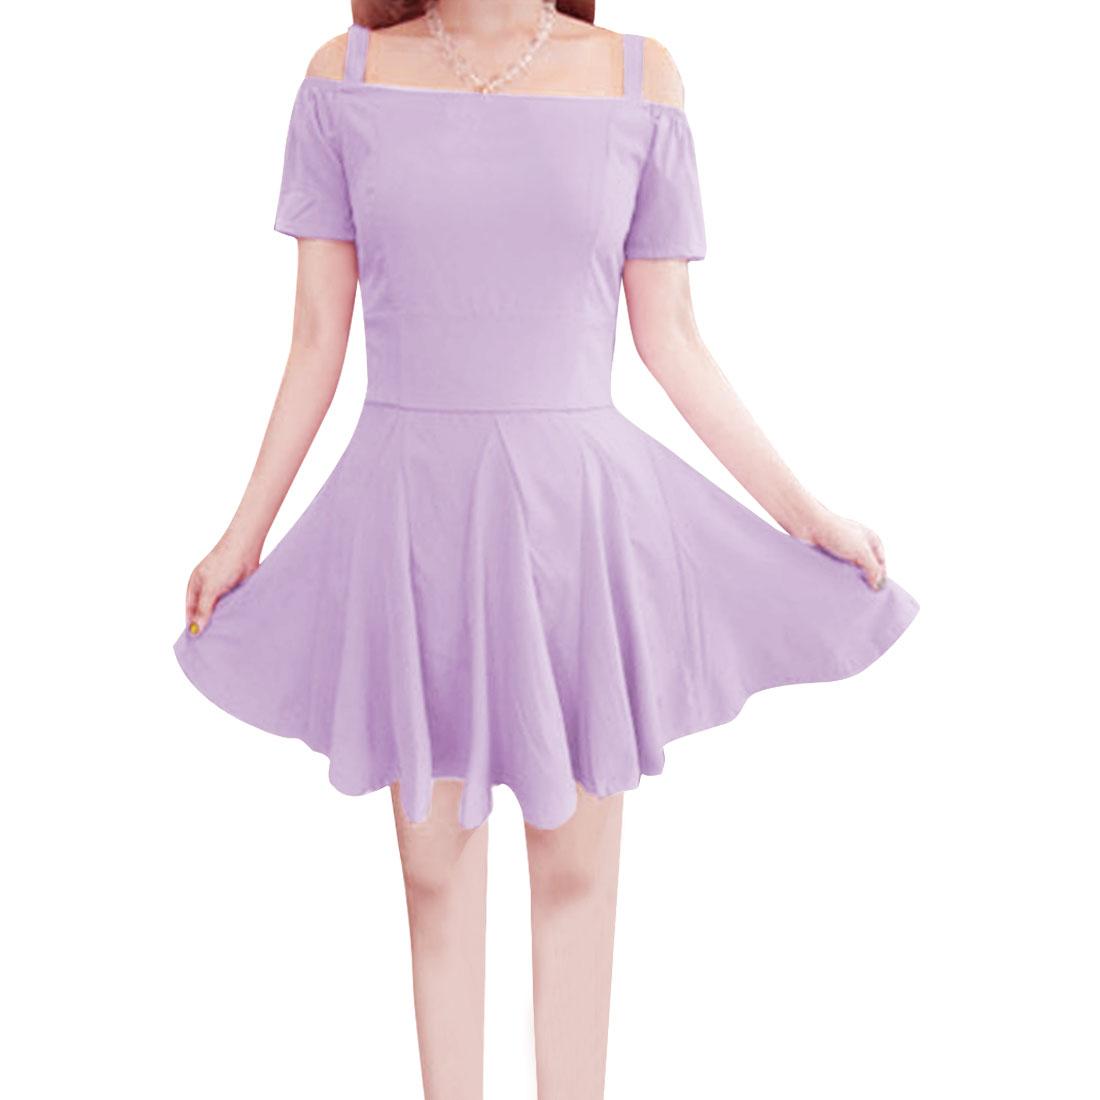 Fashion Ladies Spaghetti Strap Zip Up Right Dress Lilac XS